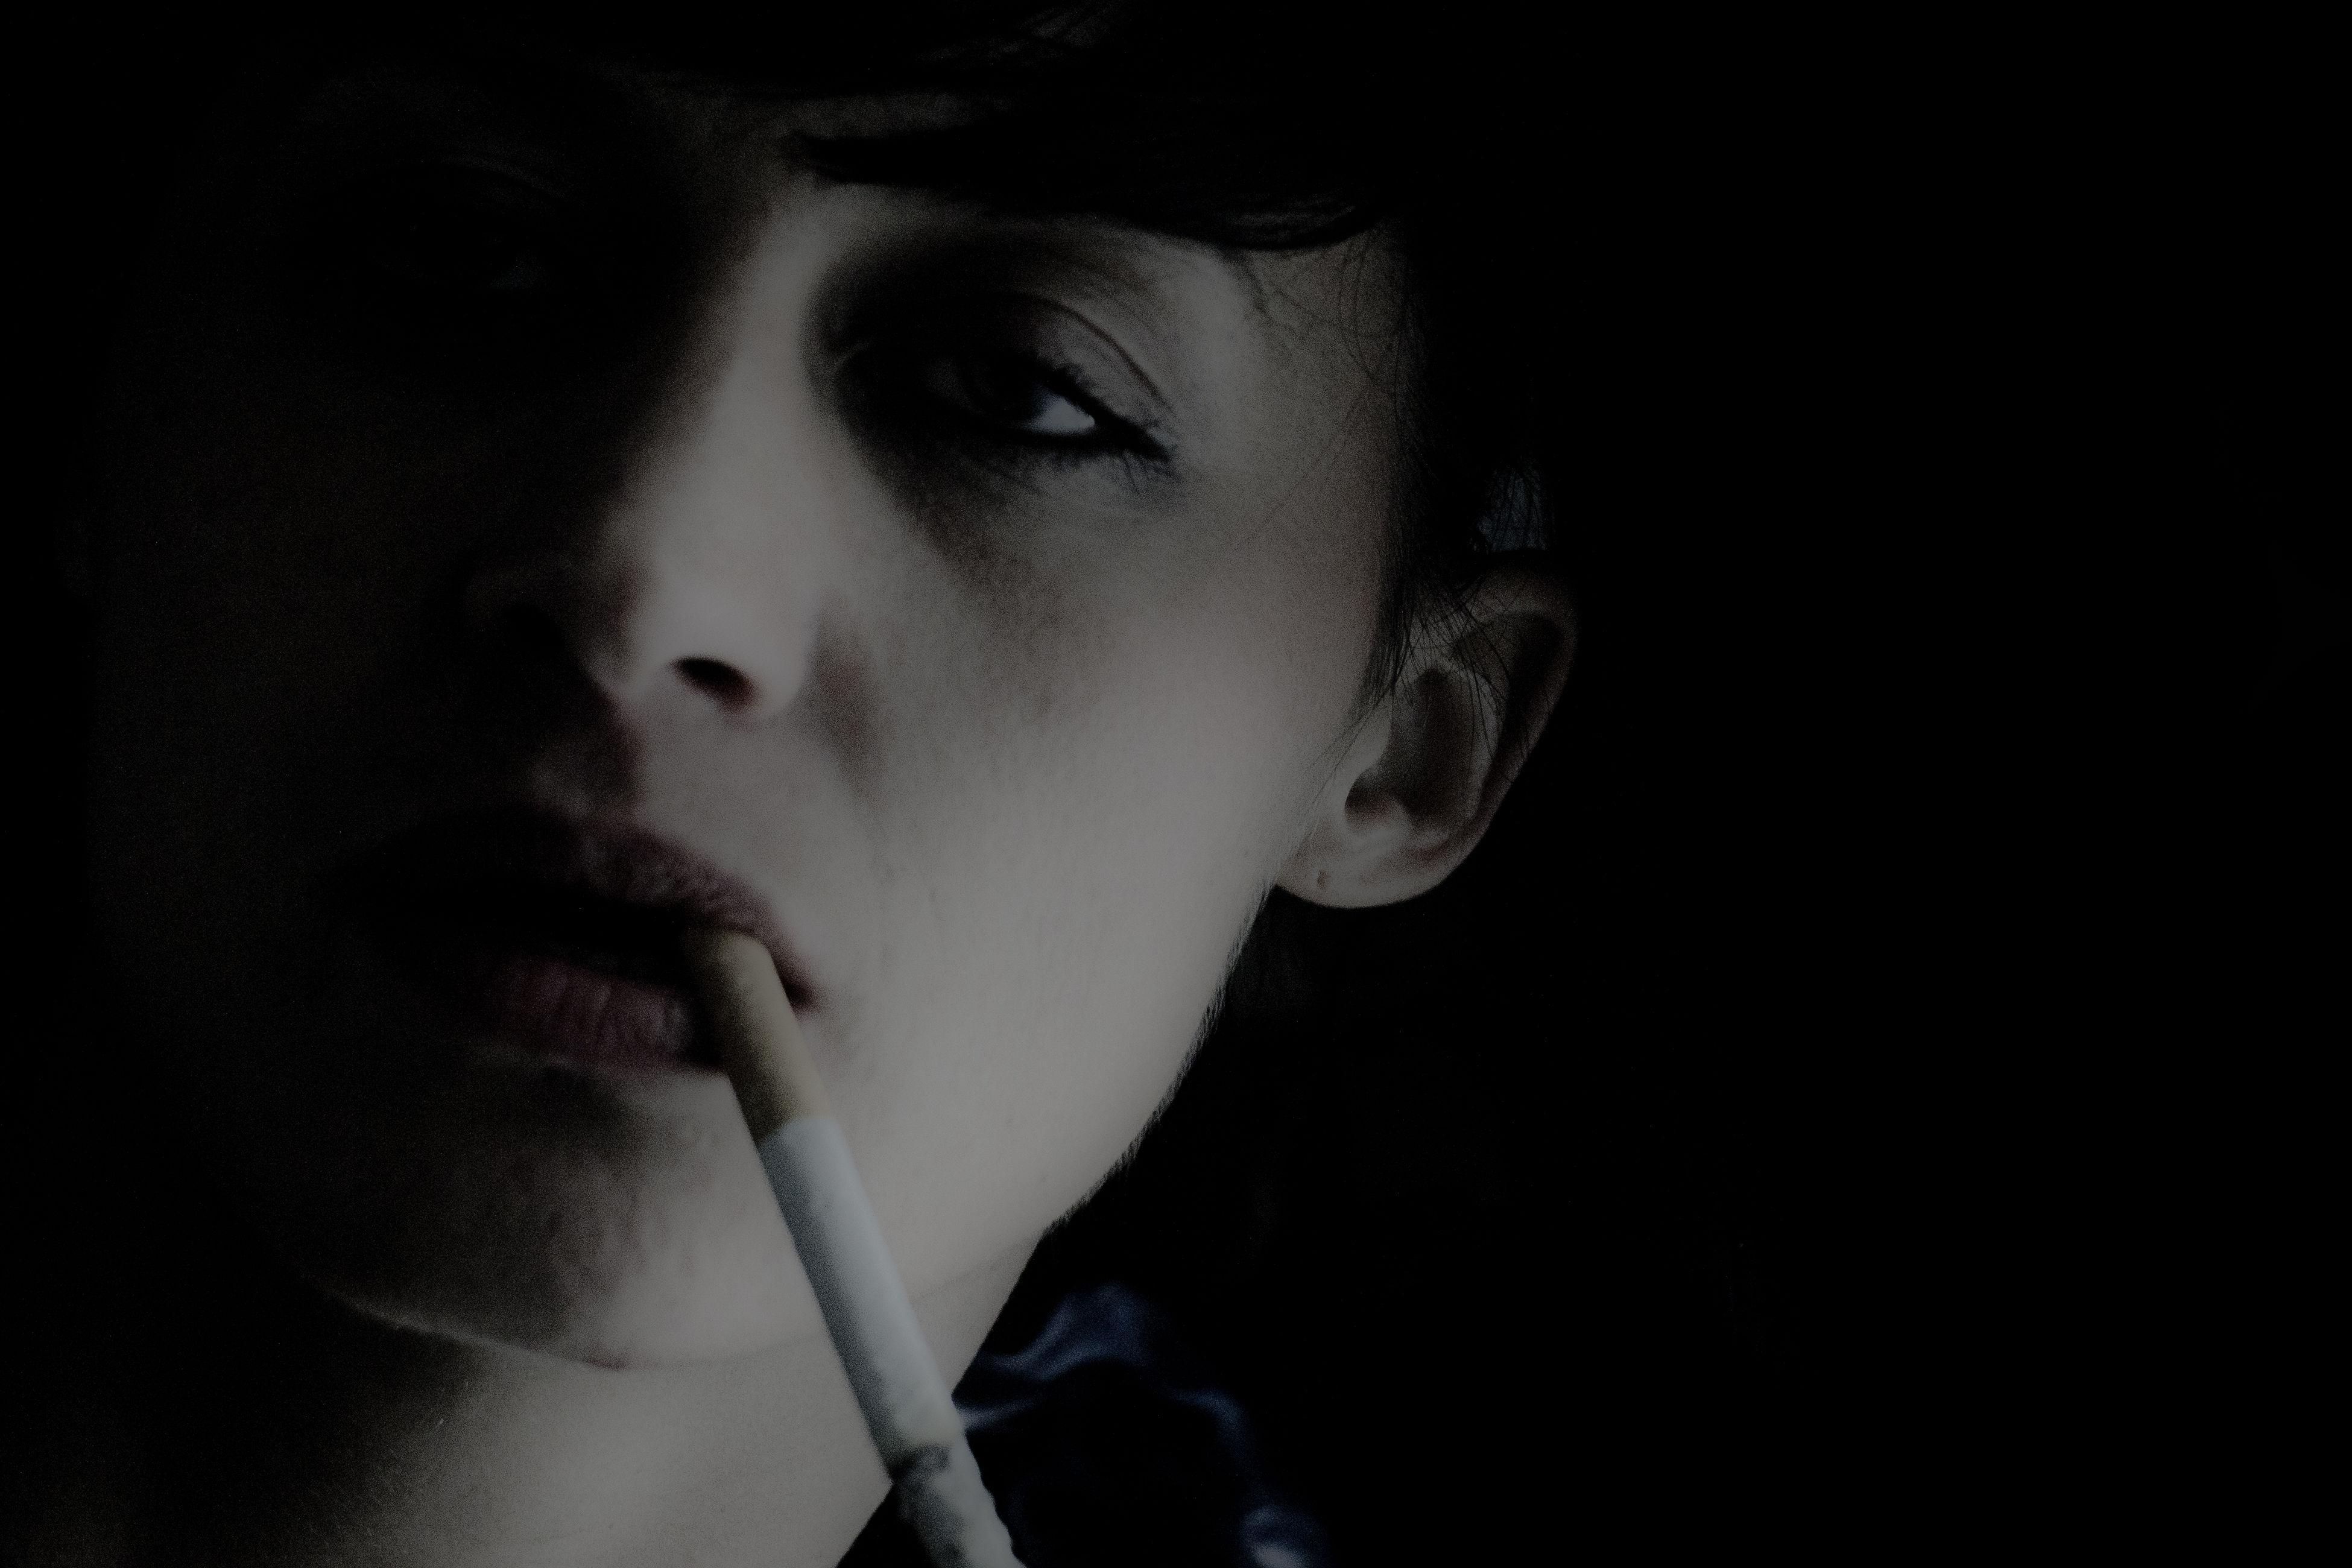 headshot, lifestyles, close-up, portrait, human face, contemplation, serious, leisure activity, black background, staring